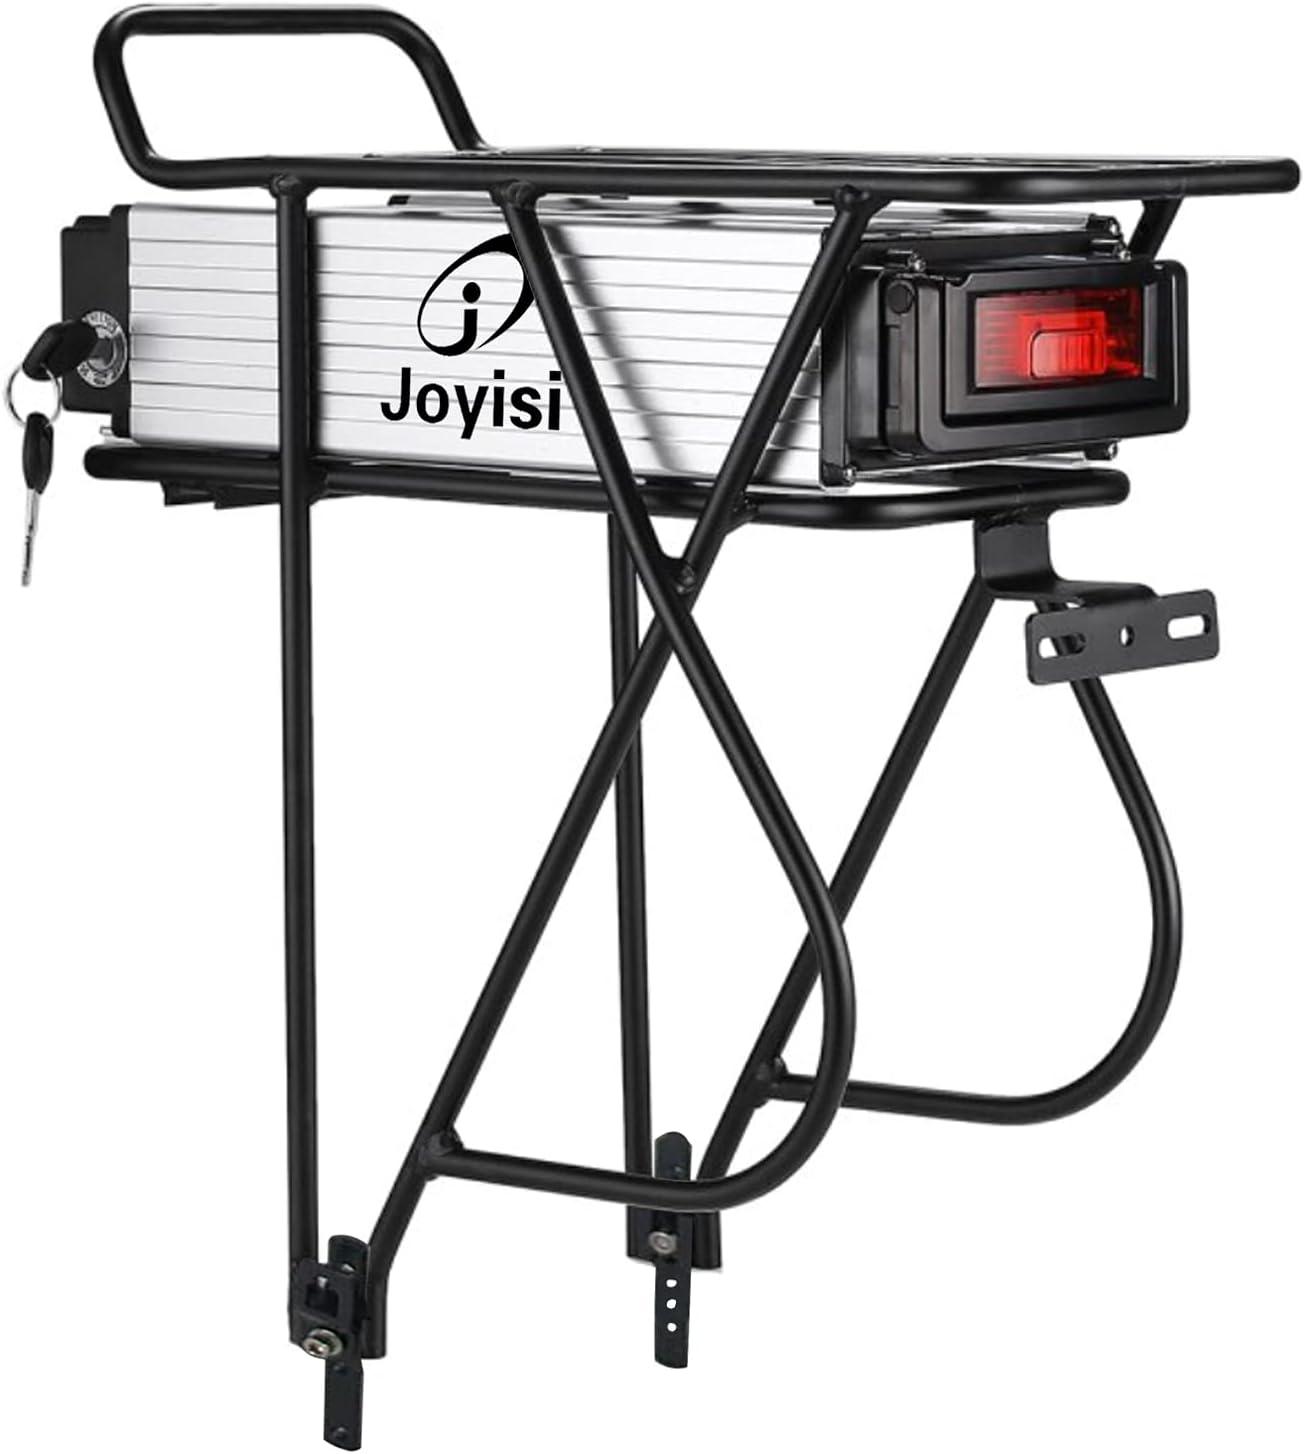 Joyisi Ebike Battery 52V 48V 36V Cheap Max 57% OFF 20AH Bike Electric for